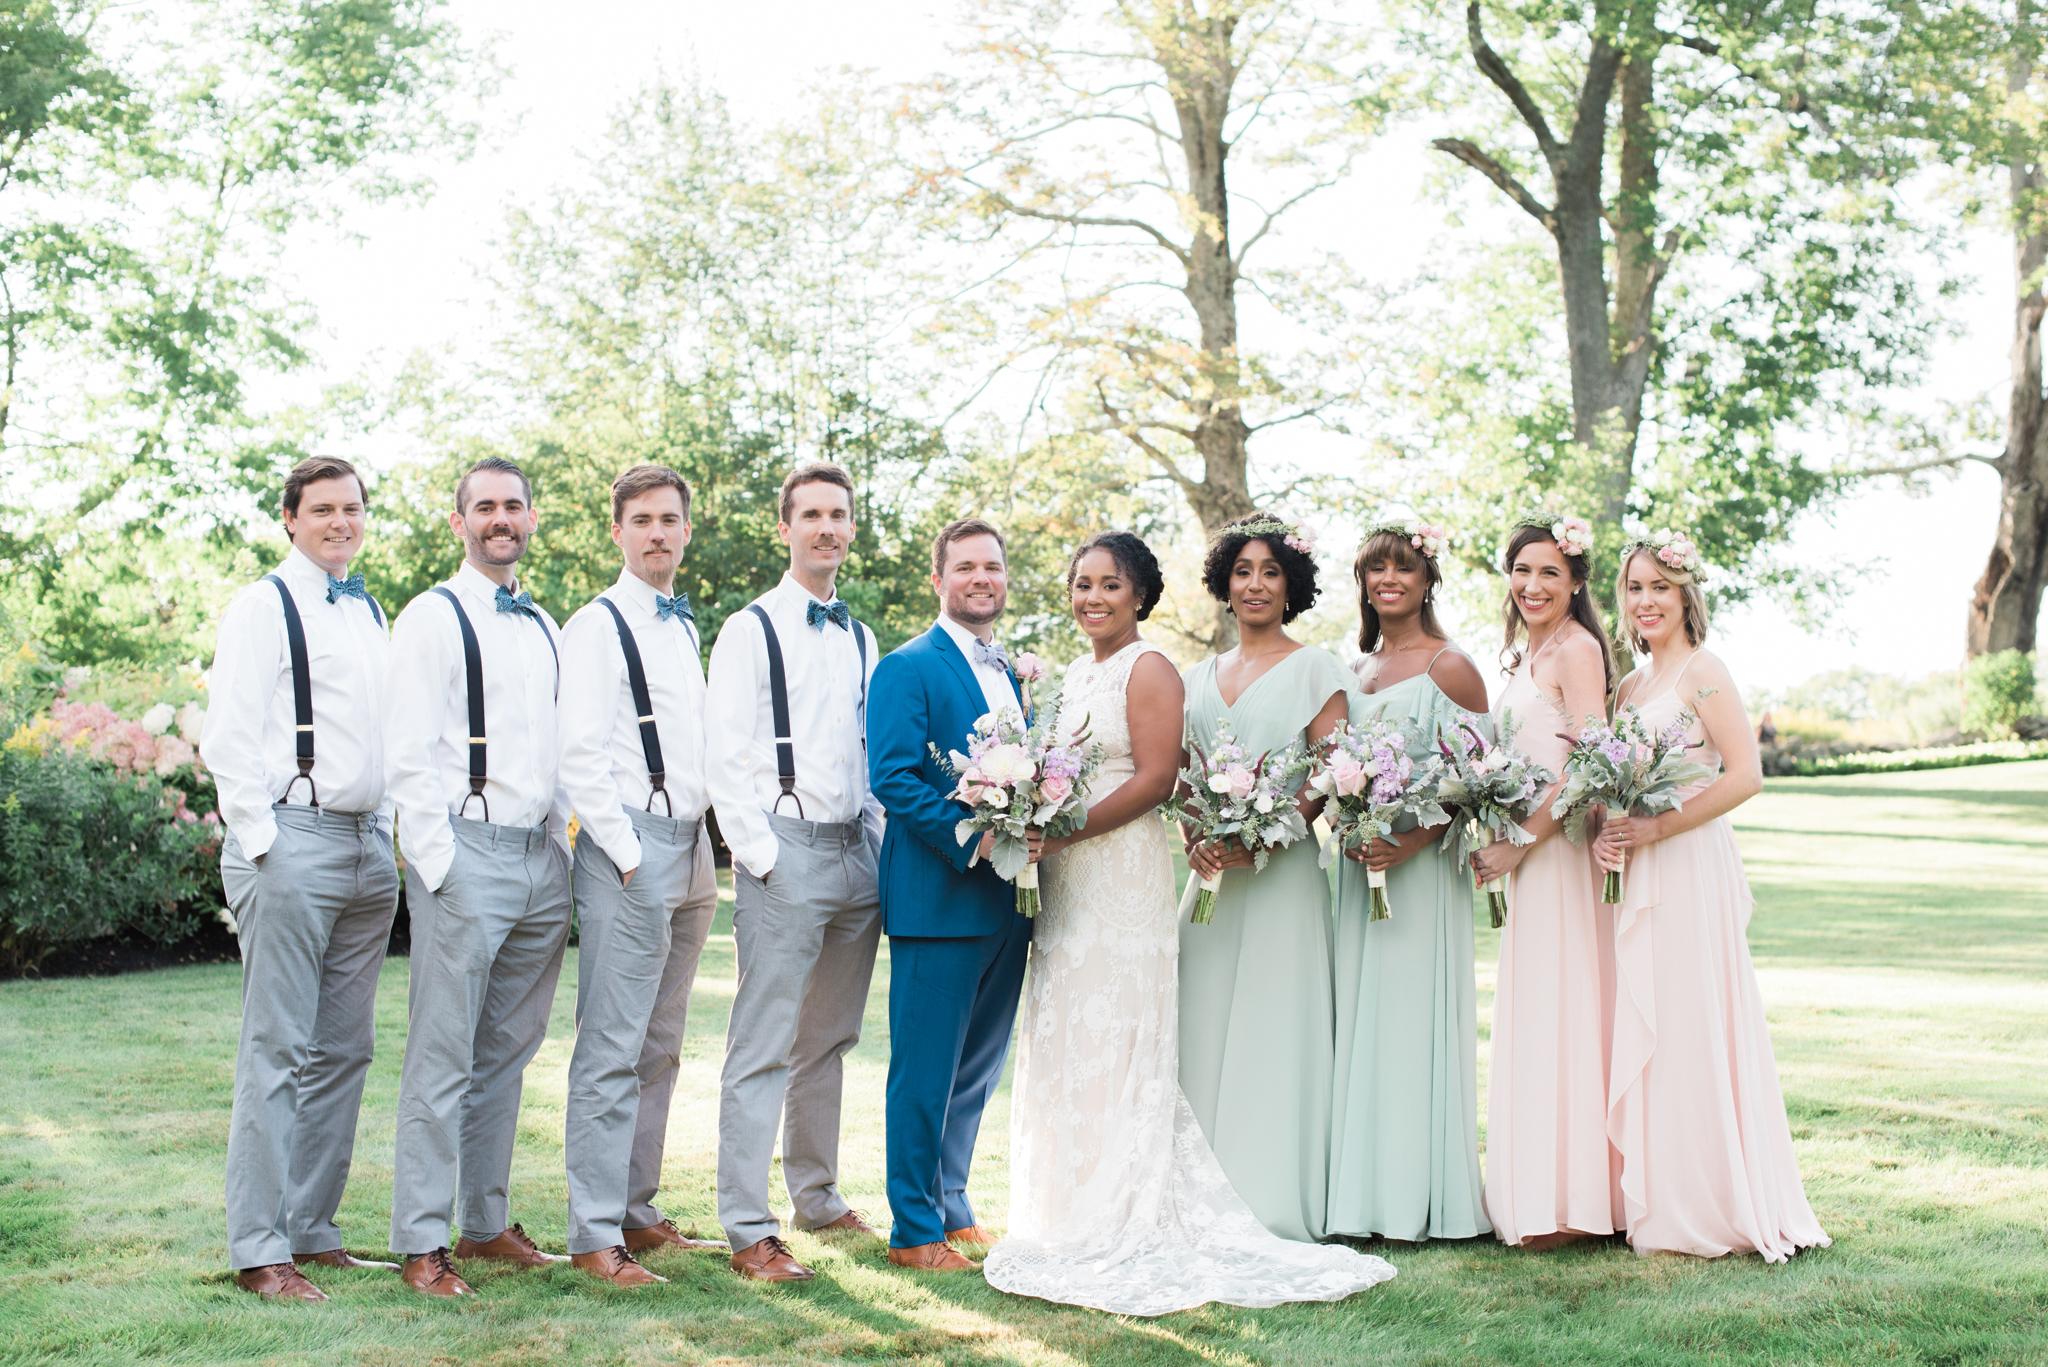 Wedding photographers in Western MA